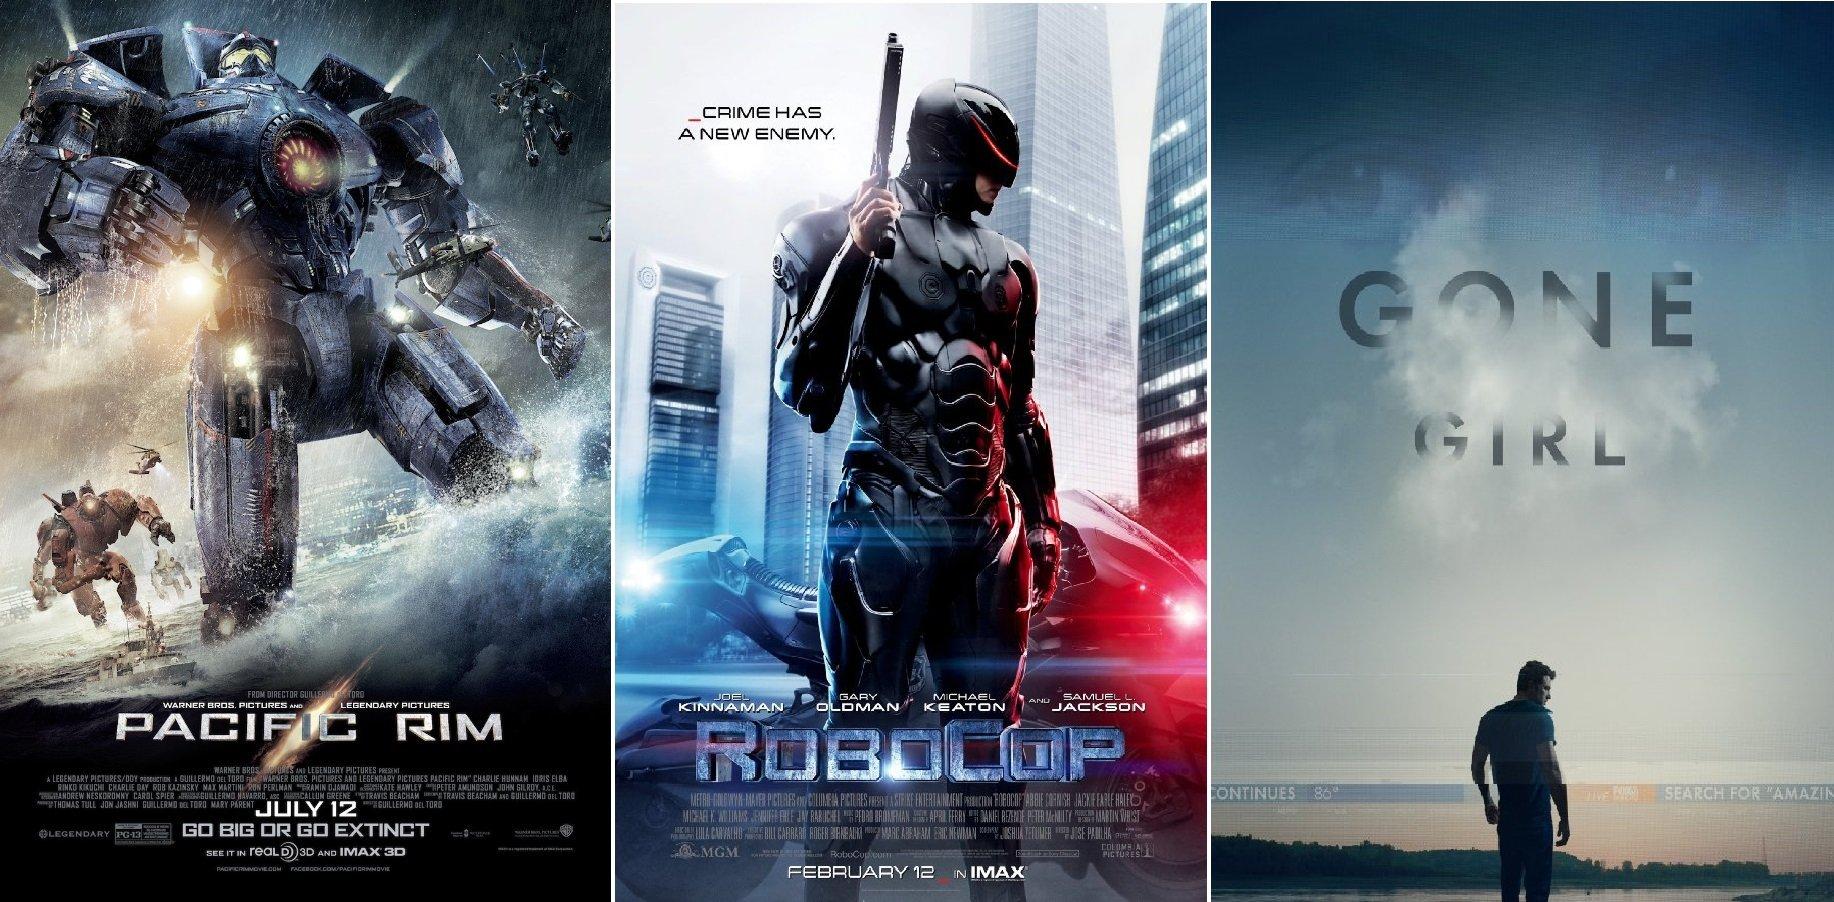 Киномарафон старика Сарказмо #1: Gone Girl / Robocop (2014) / Pacific Rim. - Изображение 1